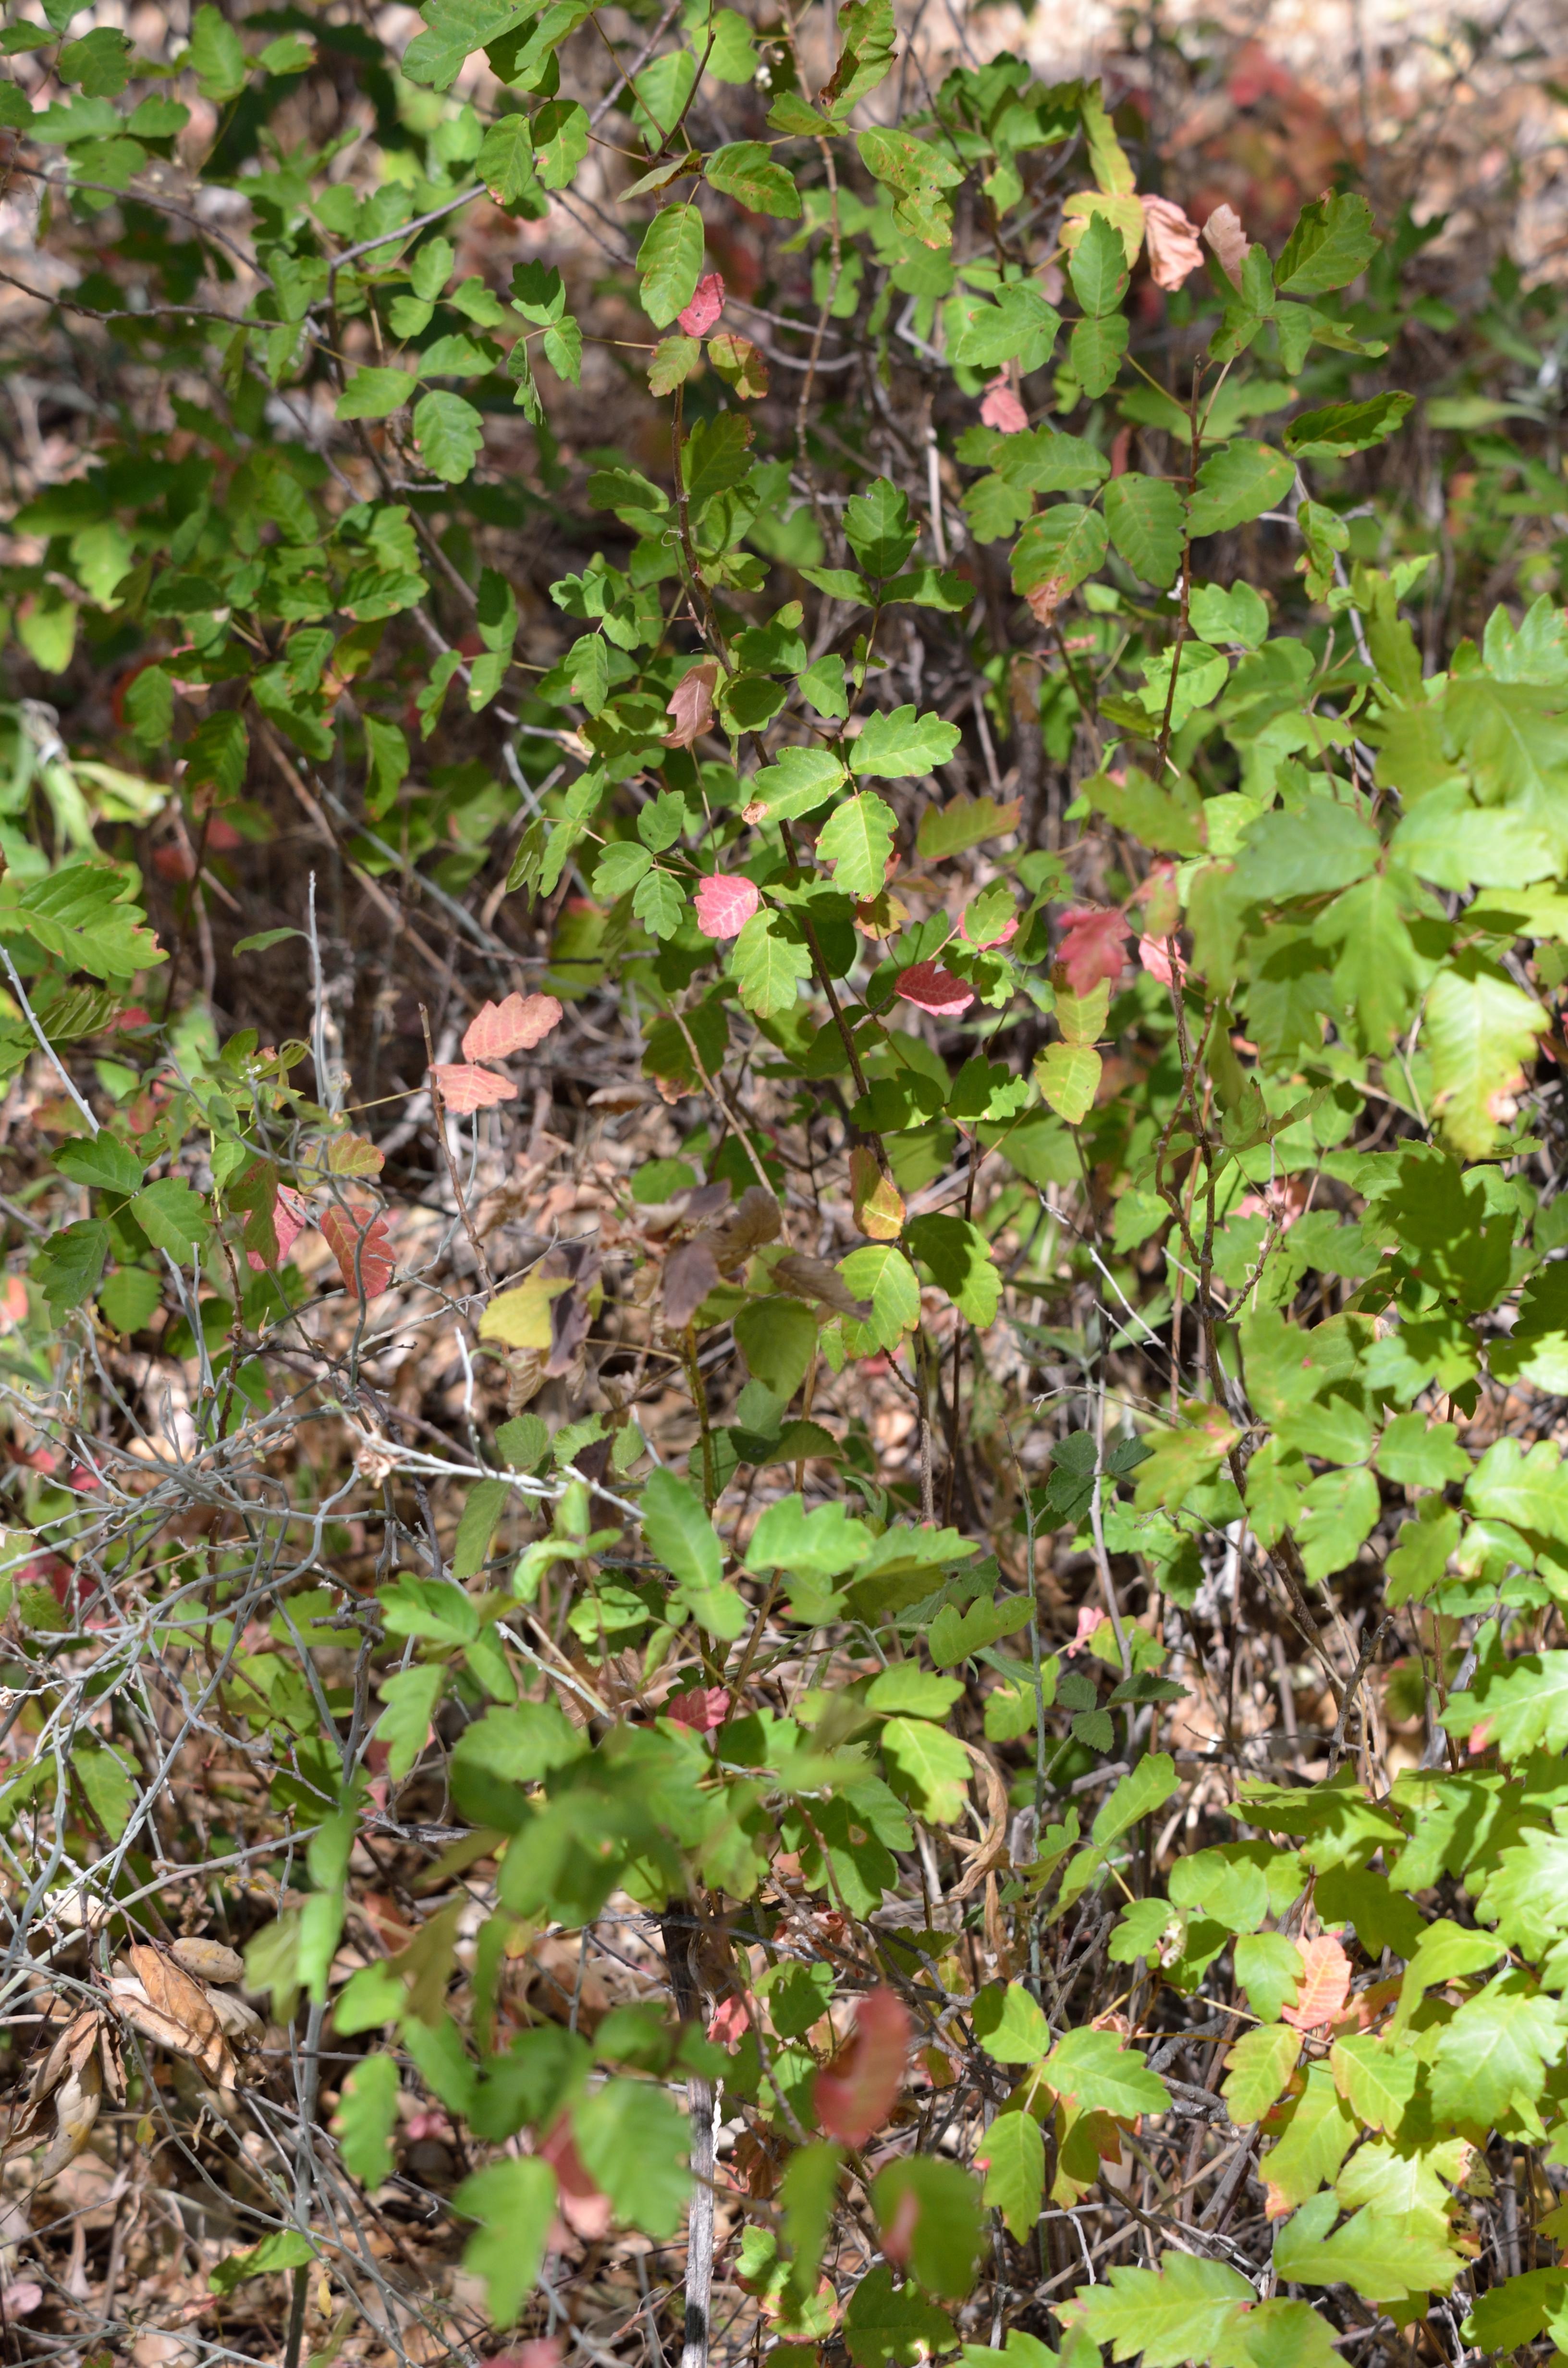 Poison Ivy : Rash, Treatment & Pictures - Live Science